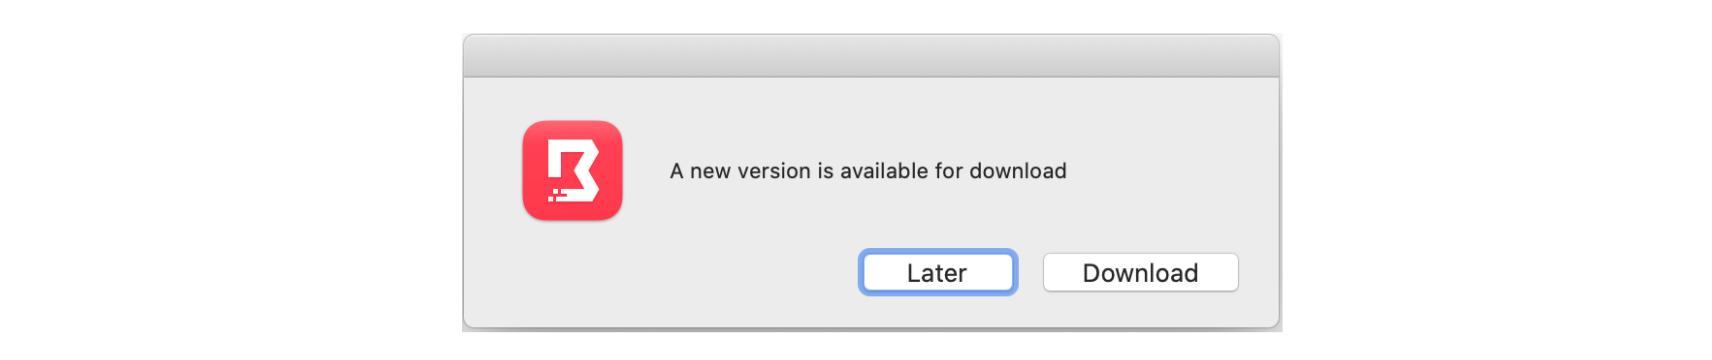 Boundary update window